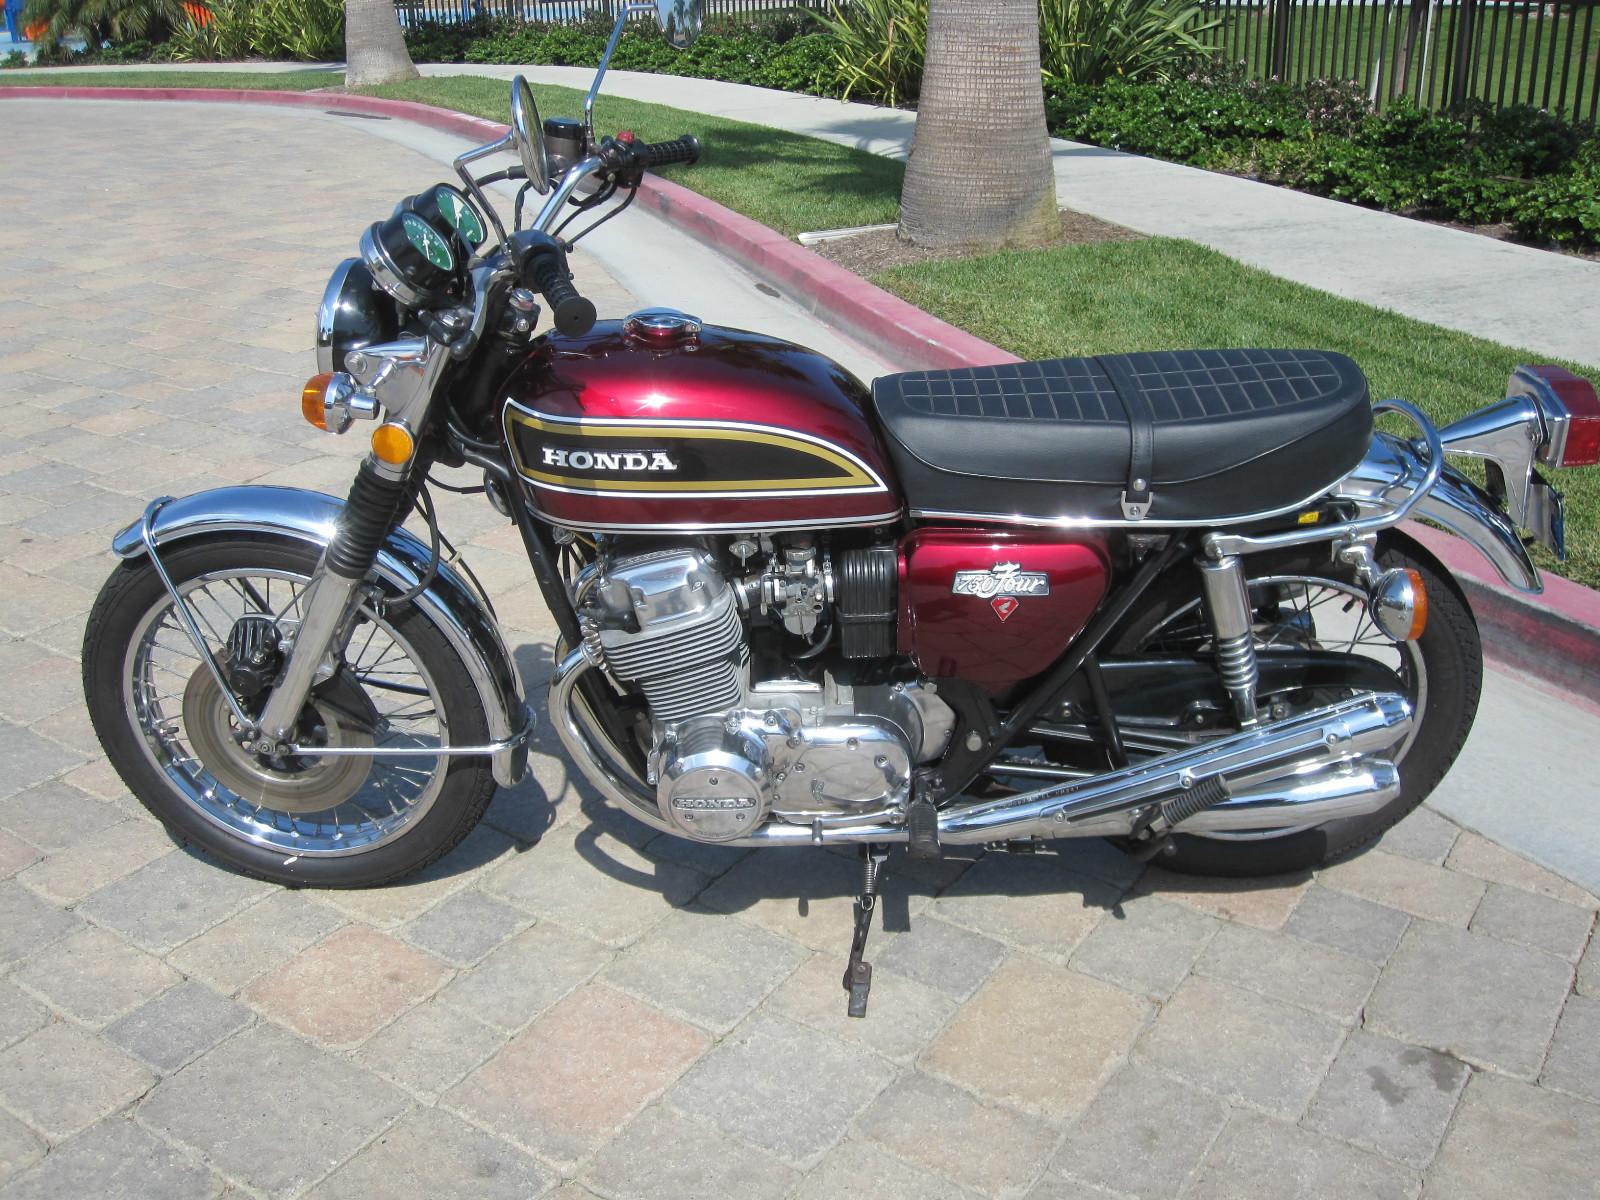 Restored Honda CB750 - 1976 Photographs at Classic Bikes ...